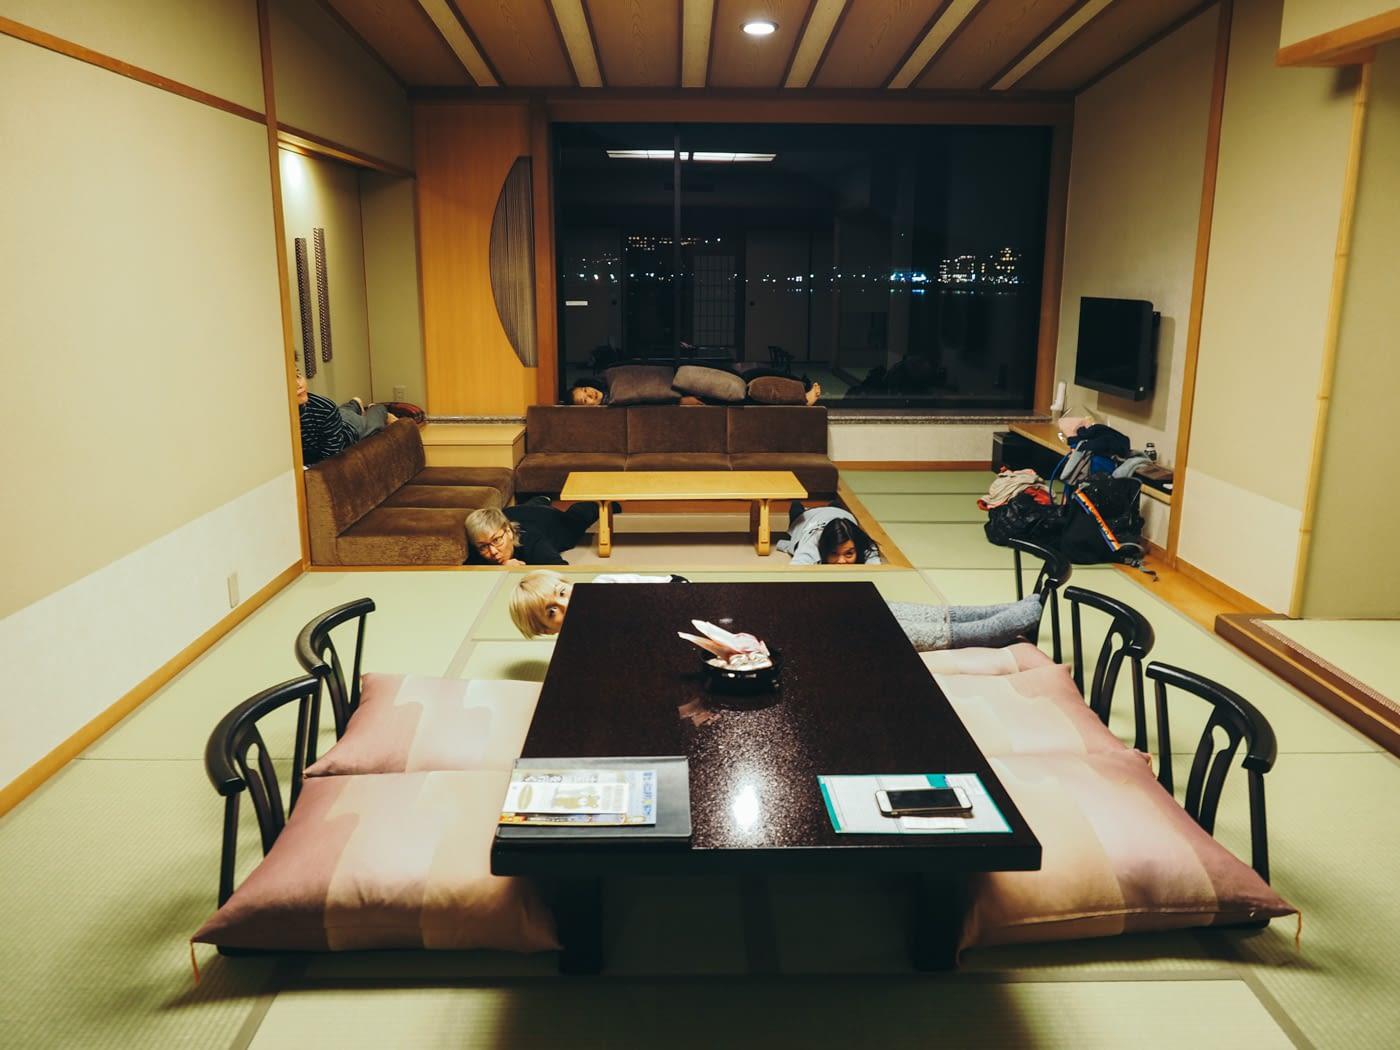 Japan - Mount Fuji - Hiding in Kozanteiubuya Ubuya Hotel room